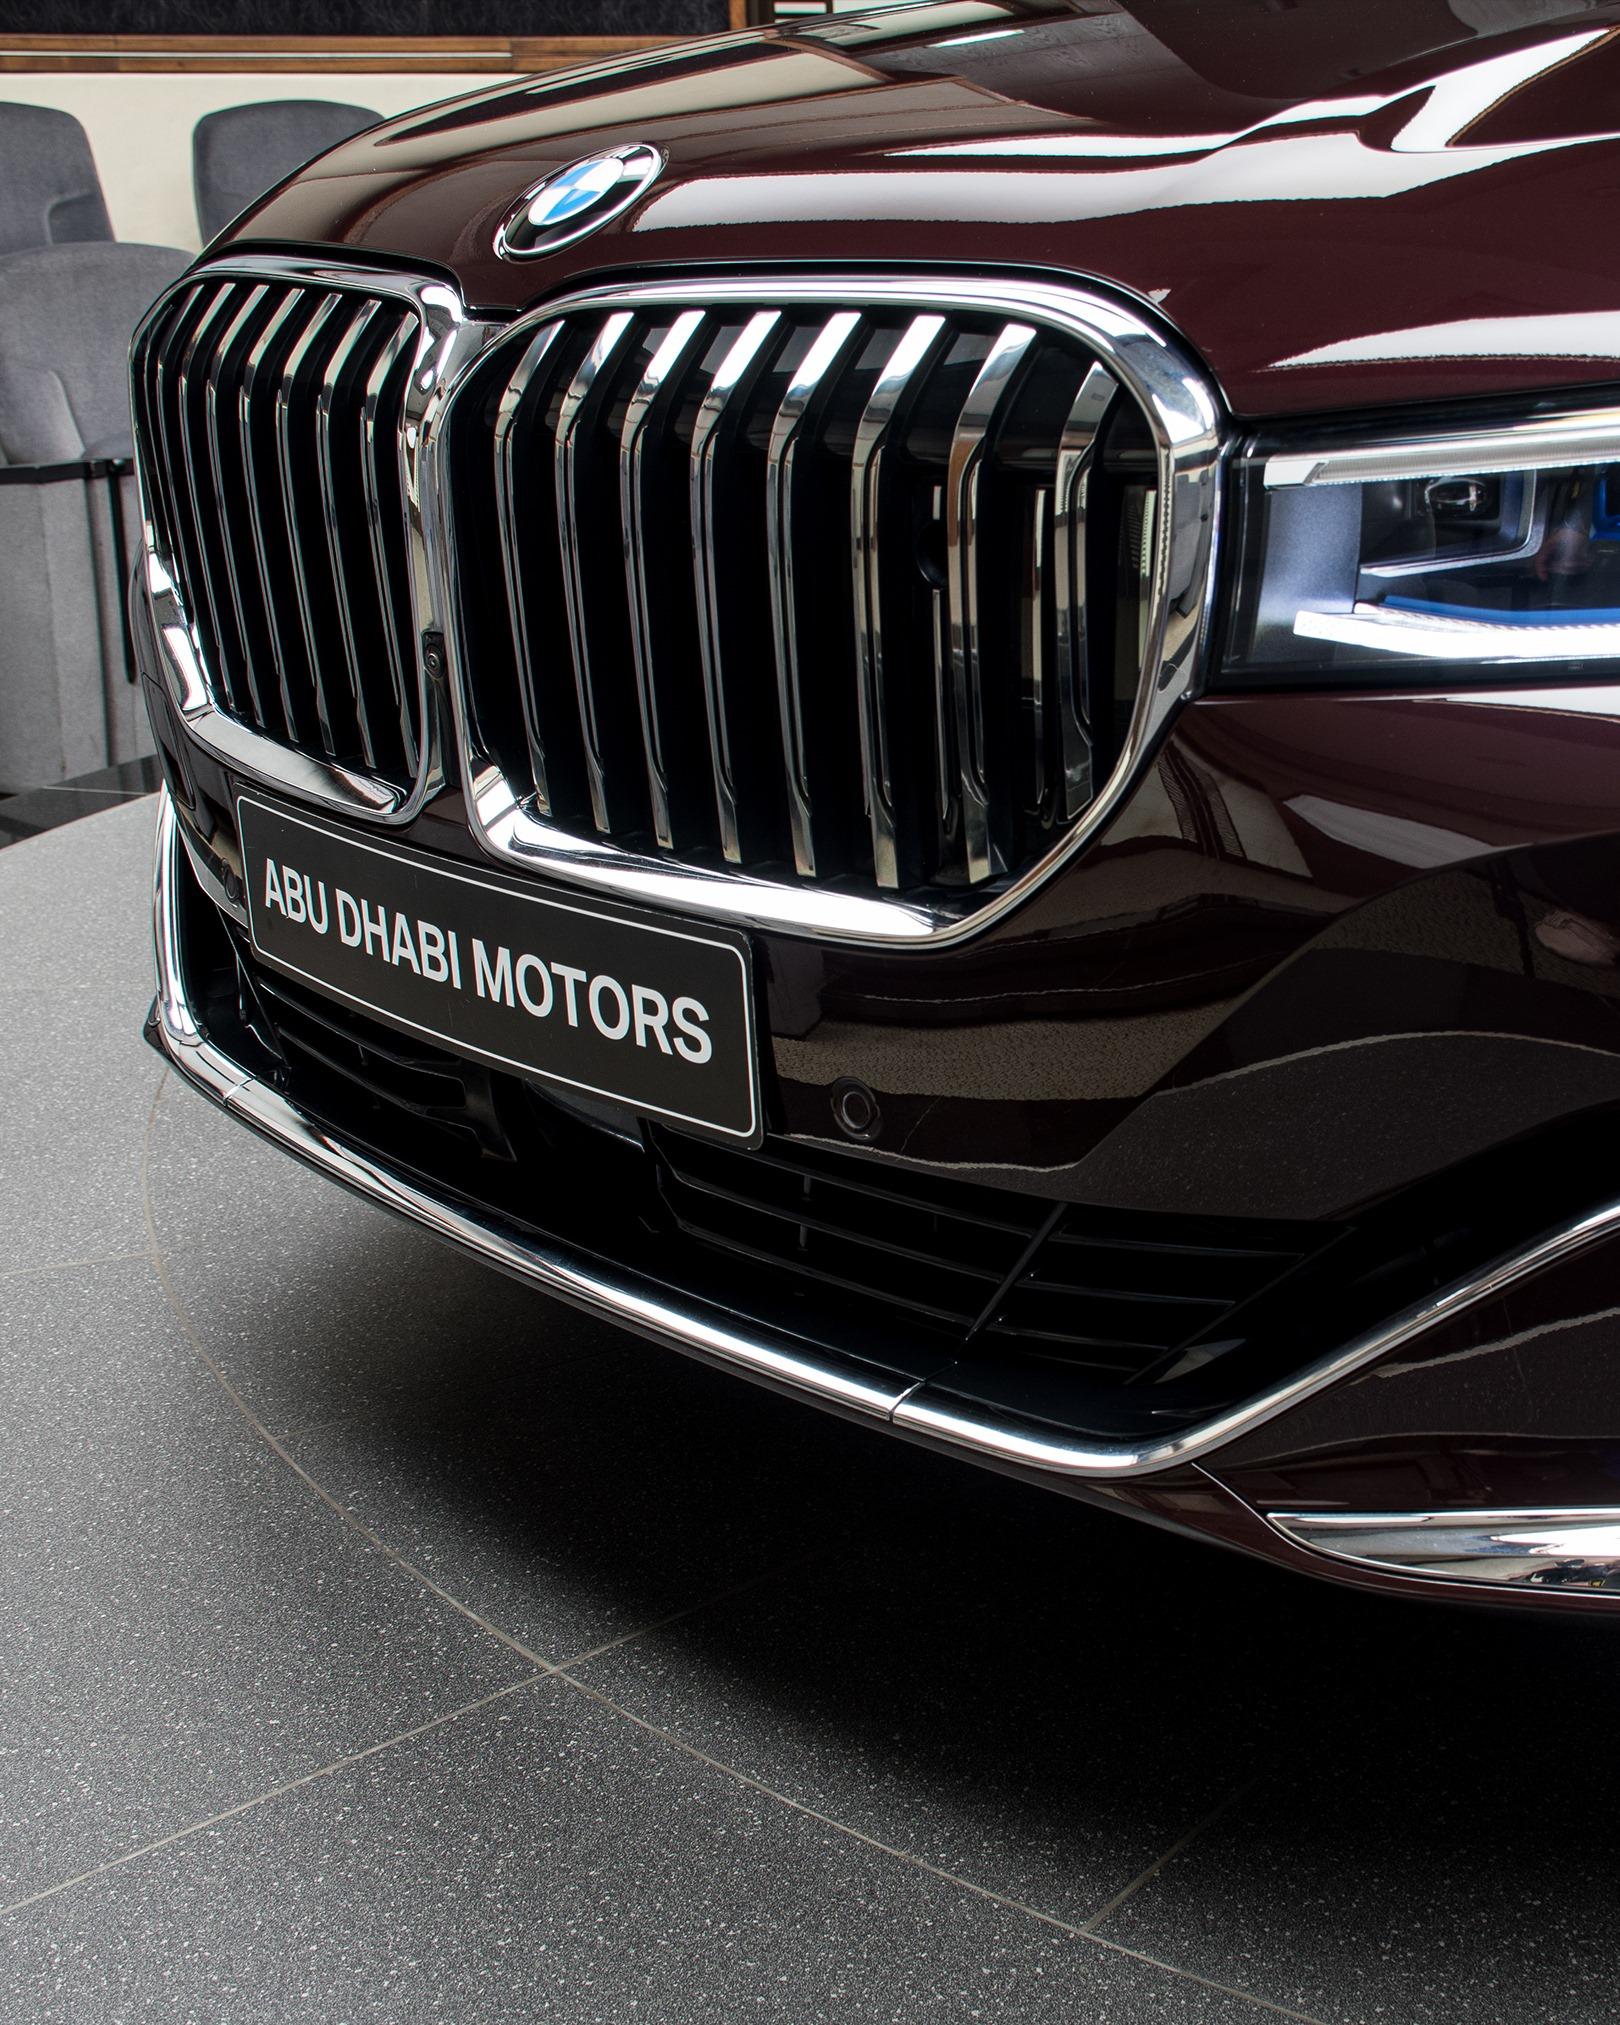 2020_BMW_750Li_Royal_Burgundy_Red_0020